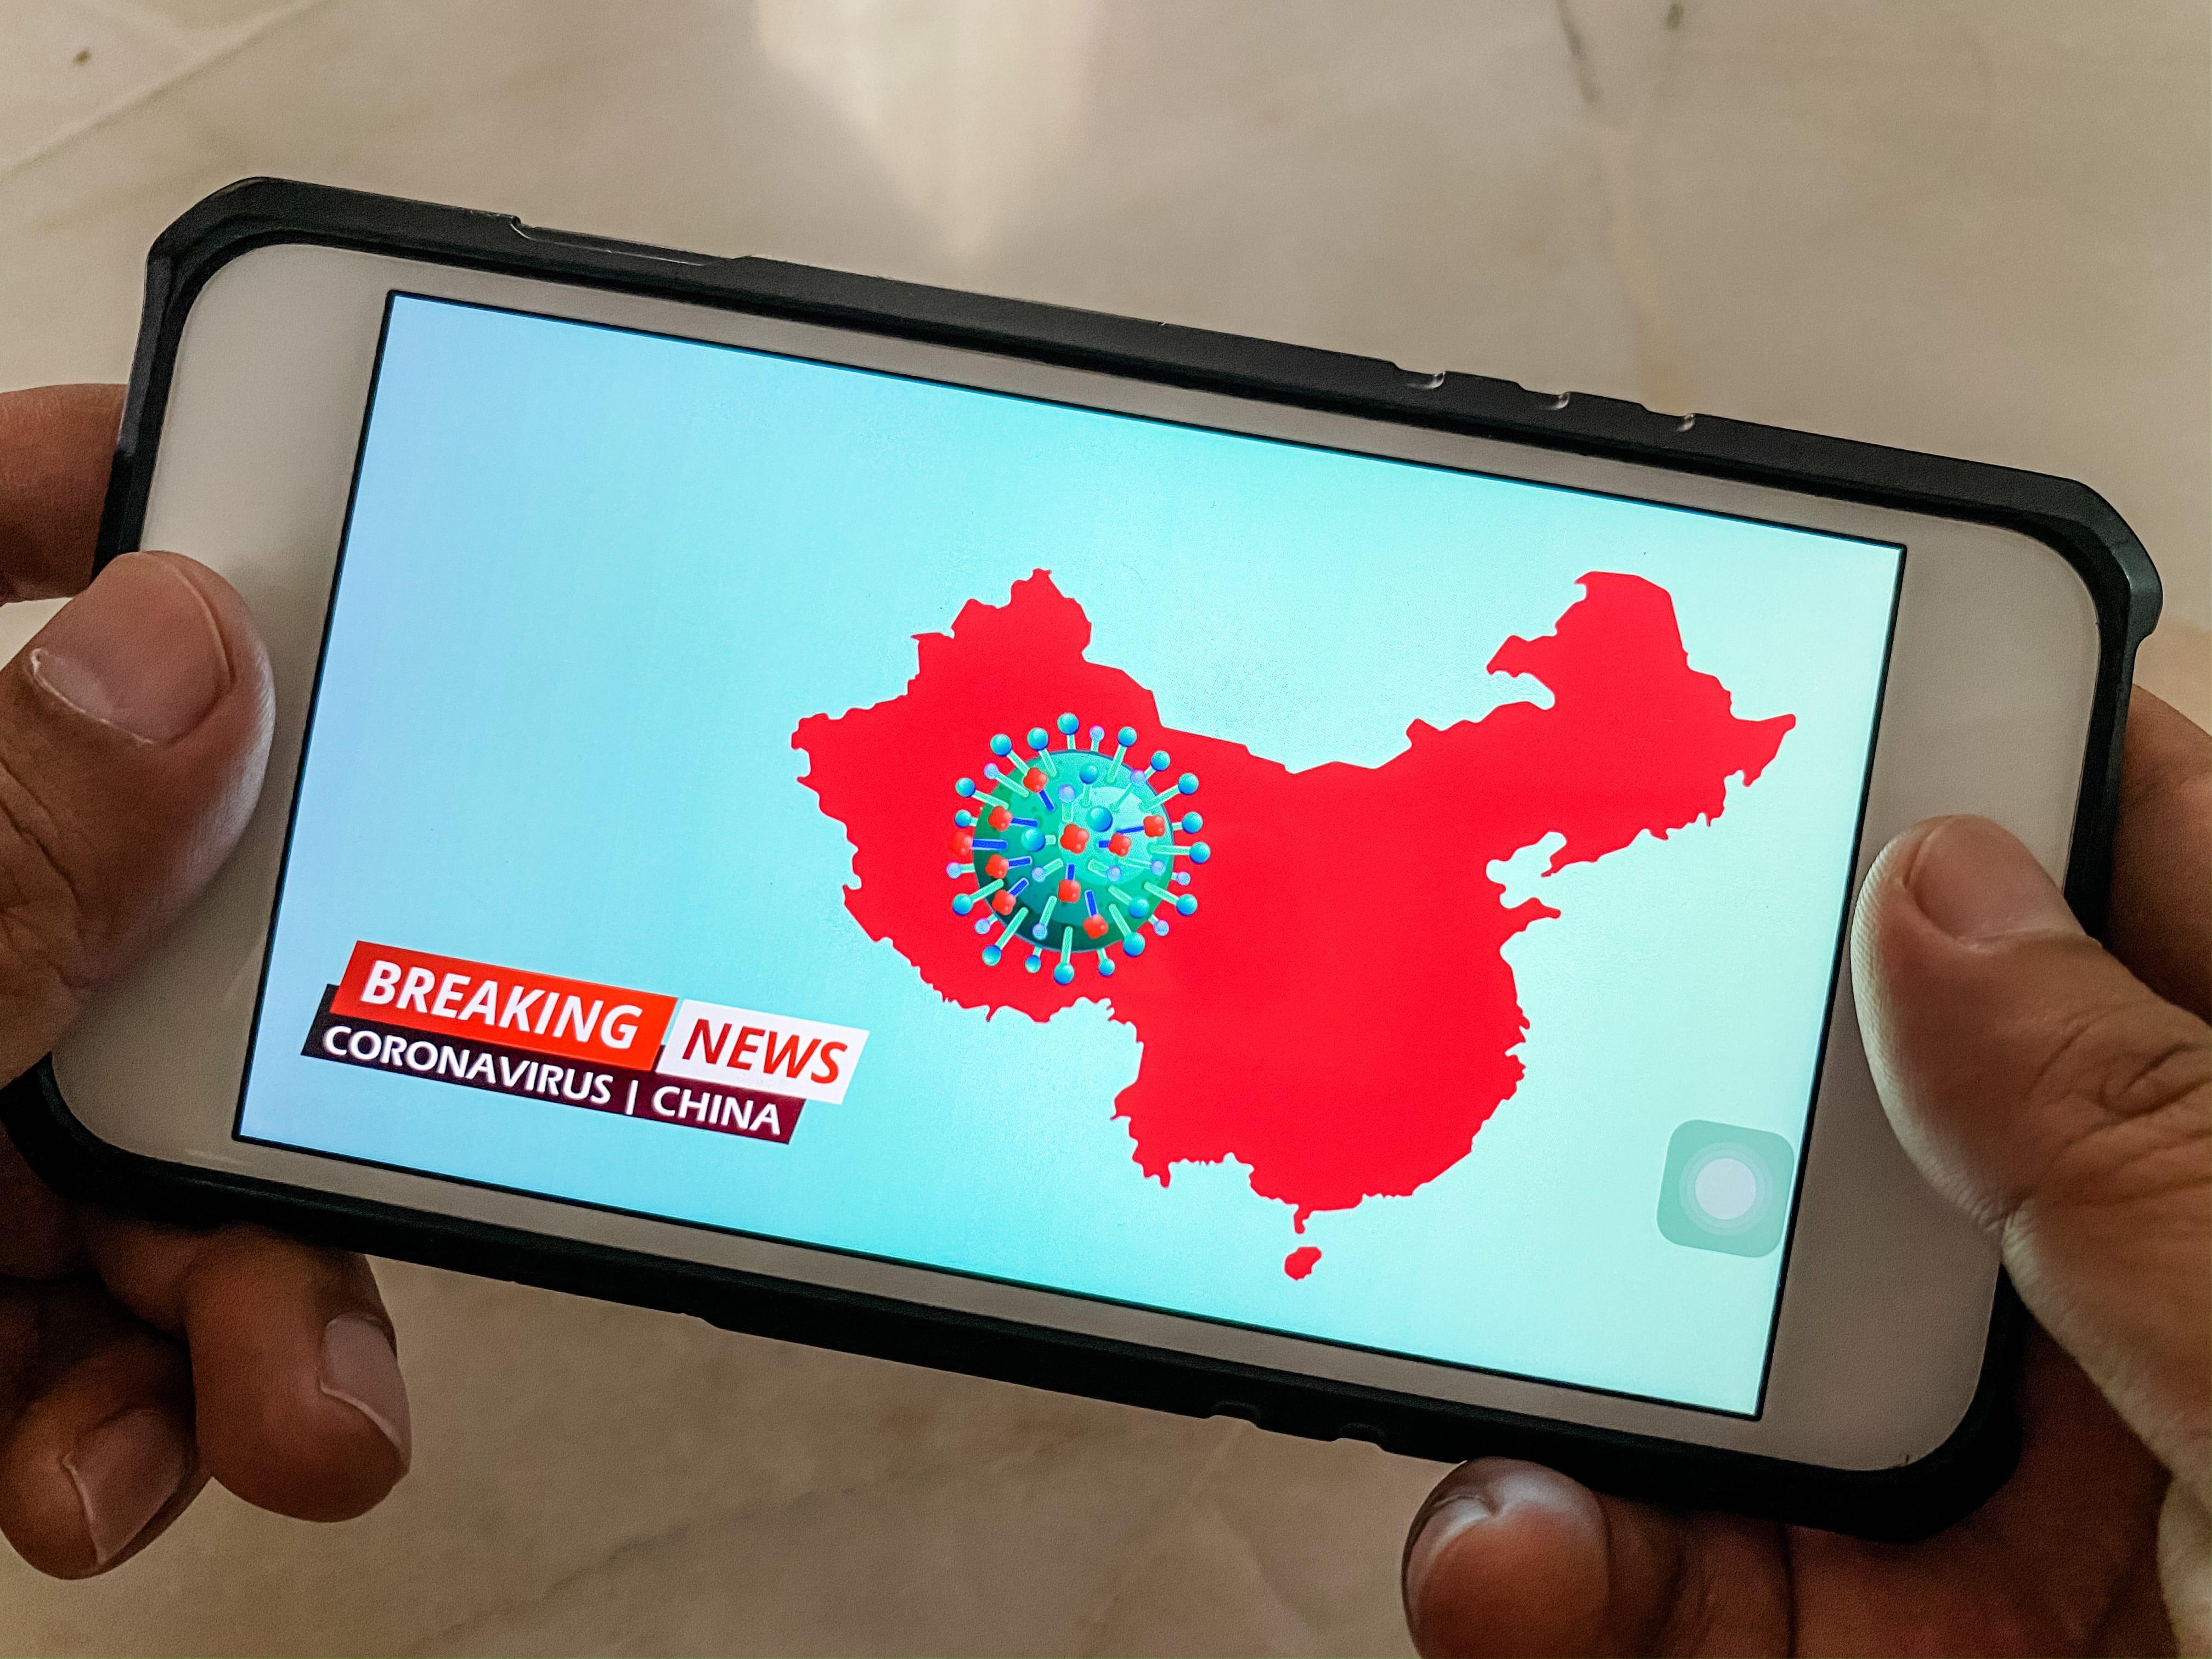 5G Plans Face Setbacks Amid Coronavirus Spread | PYMNTS.com